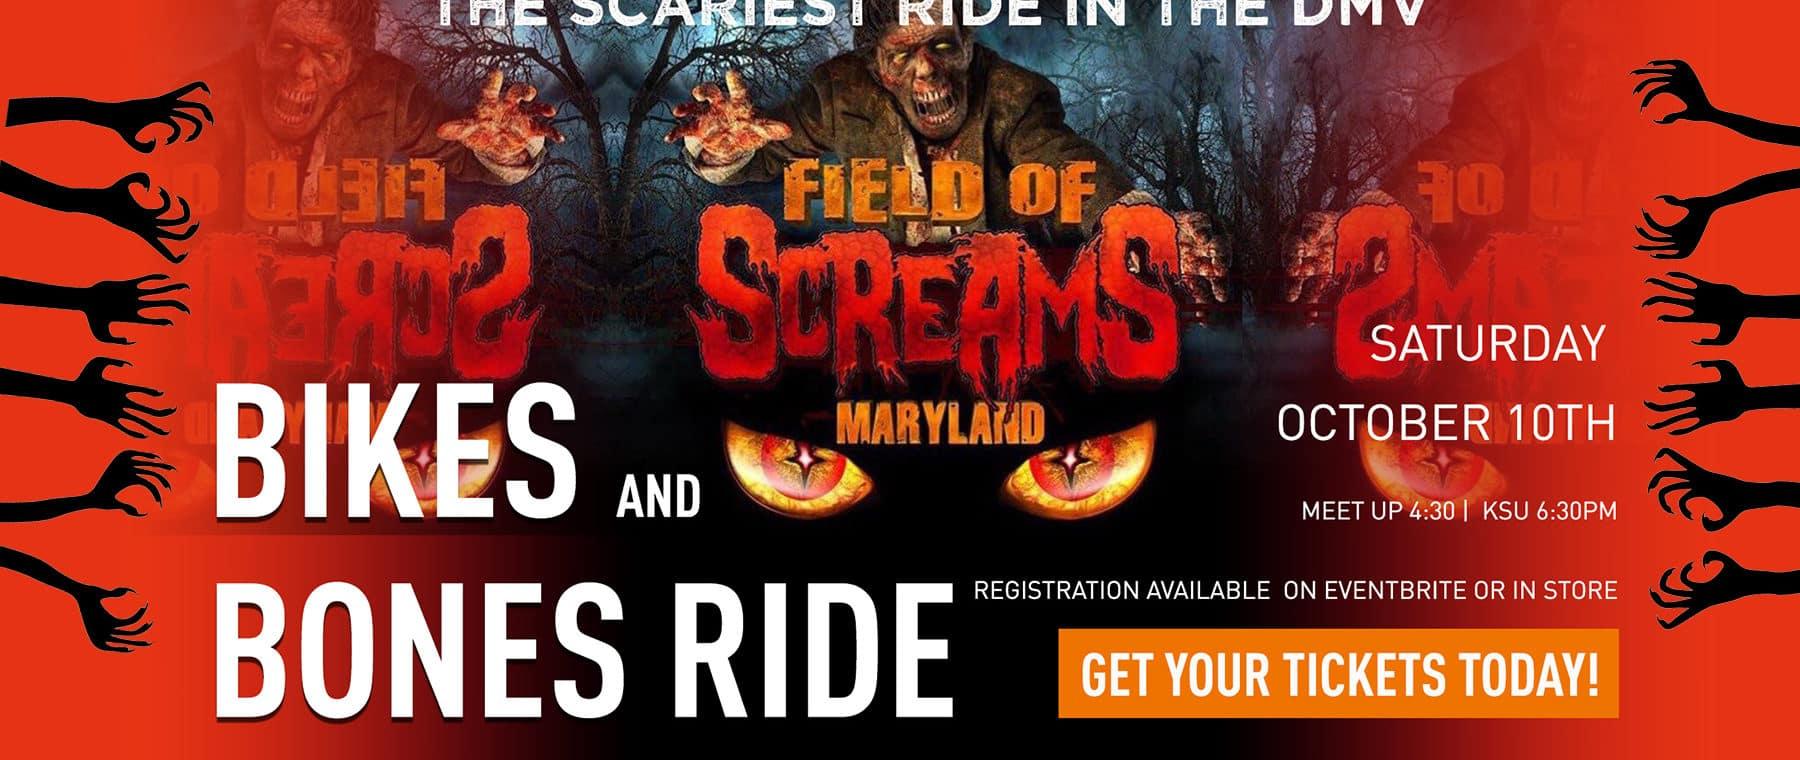 Bikes and bones, field of screams, olney md, ride, halloween